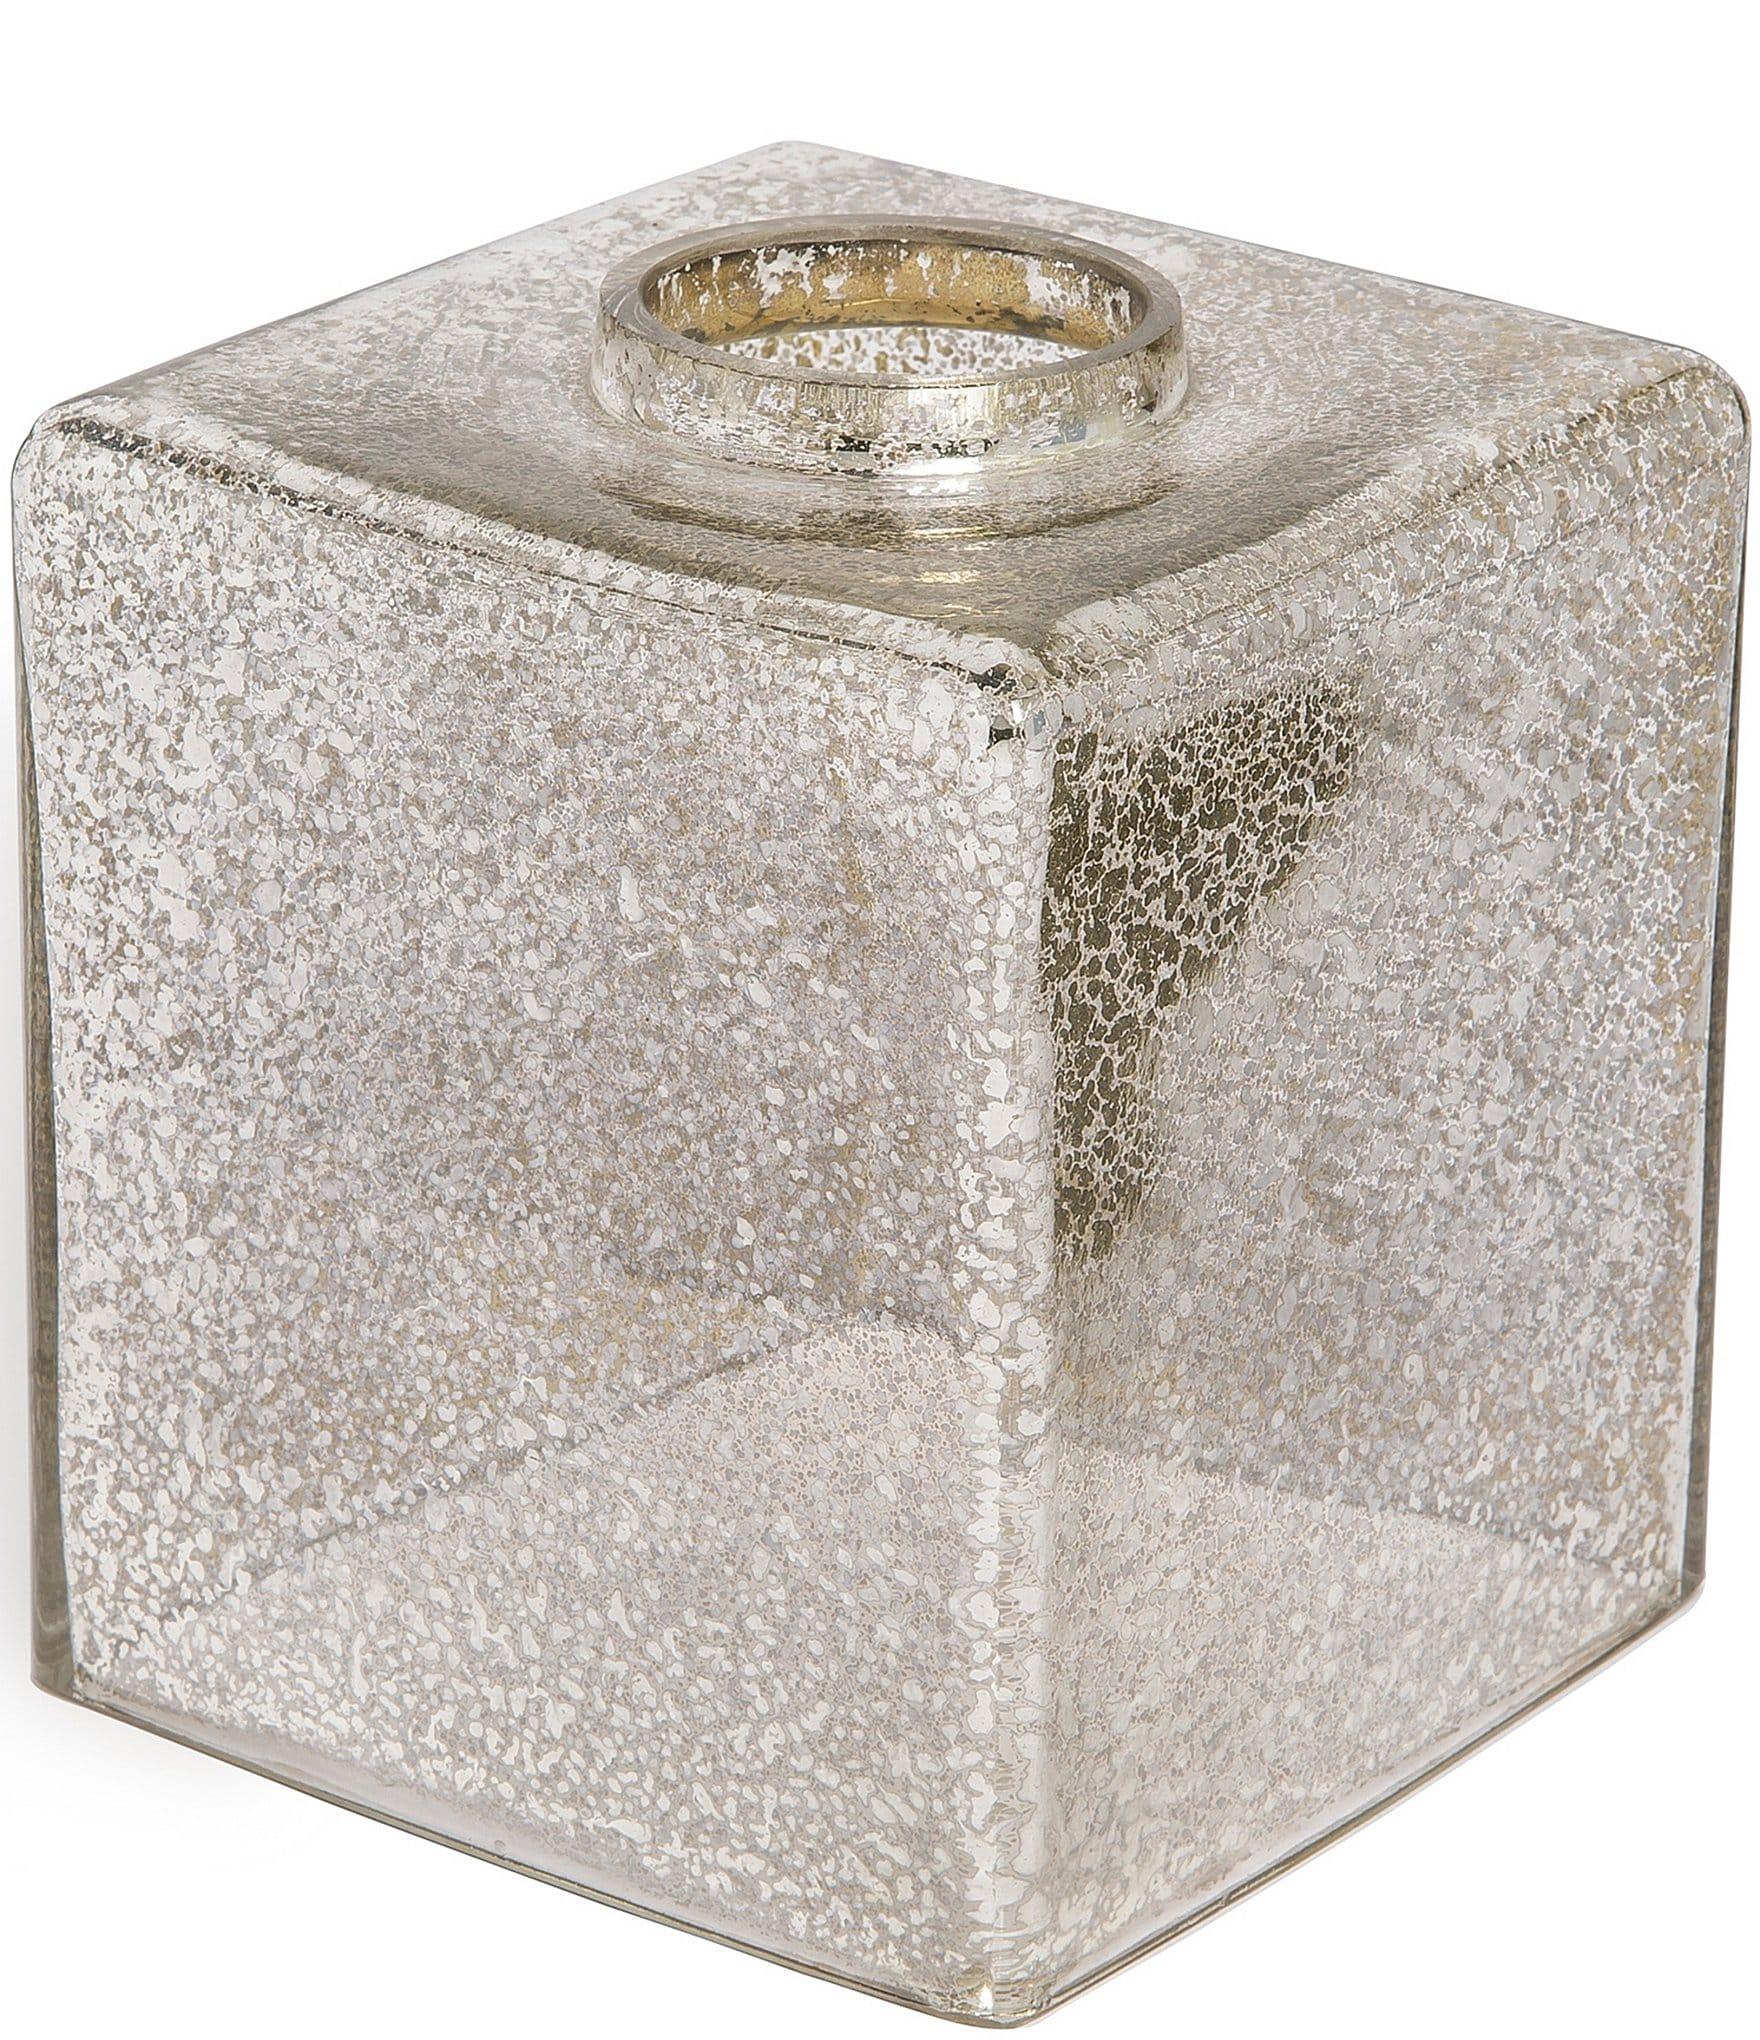 Kassatex vizcaya tissue cover dillard 39 s - Dillards bathroom accessories sets ...